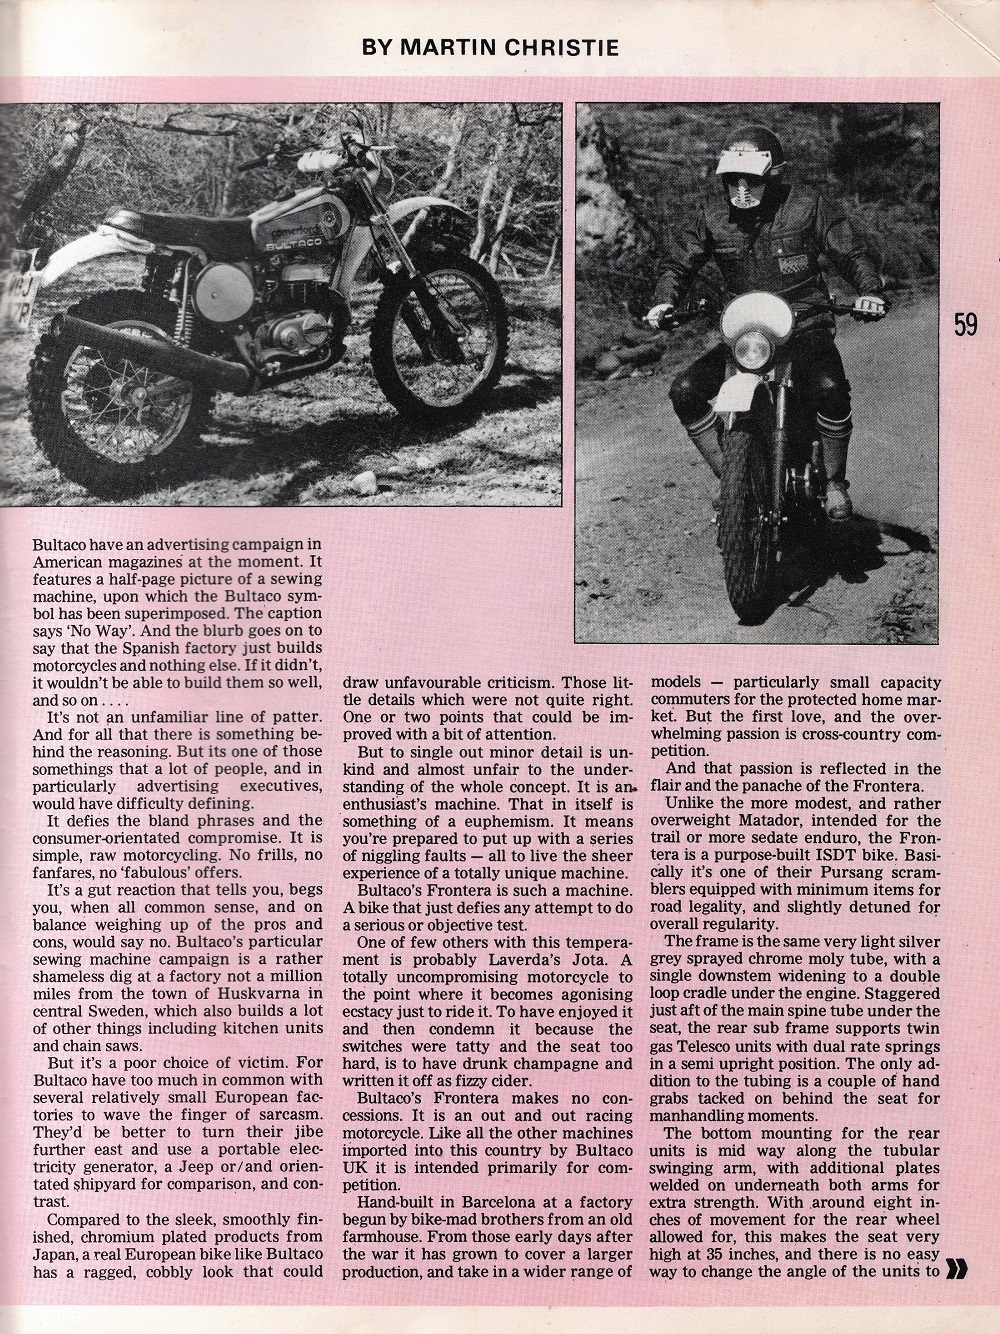 1977 Bultaco 370 Frontera road test.2.jpg